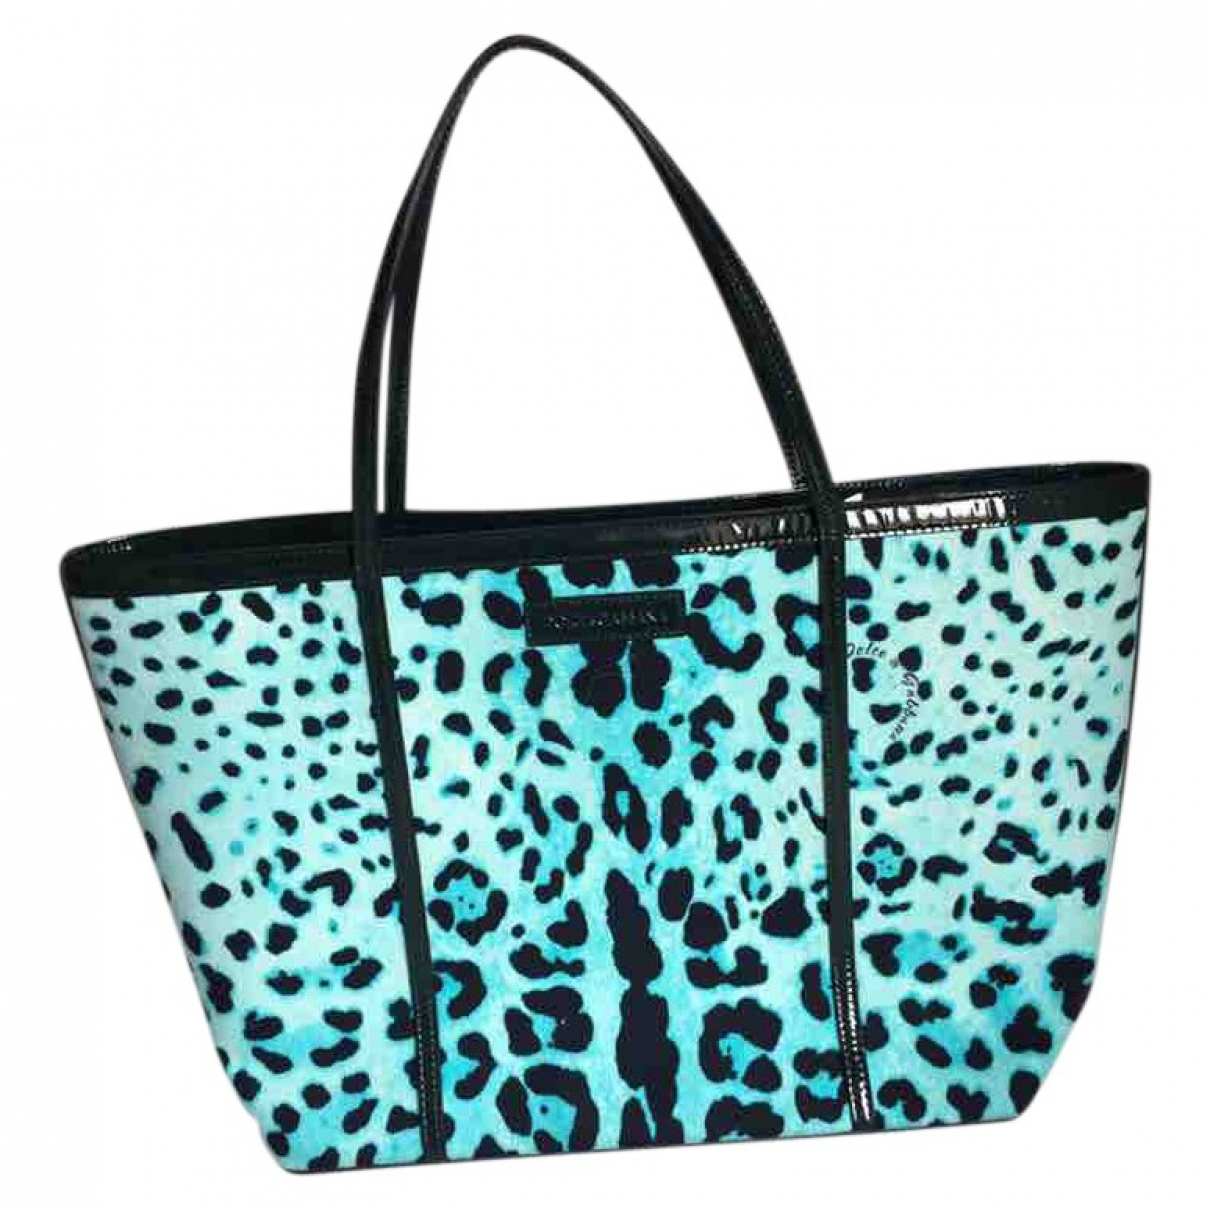 Dolce & Gabbana \N Turquoise Cloth handbag for Women \N